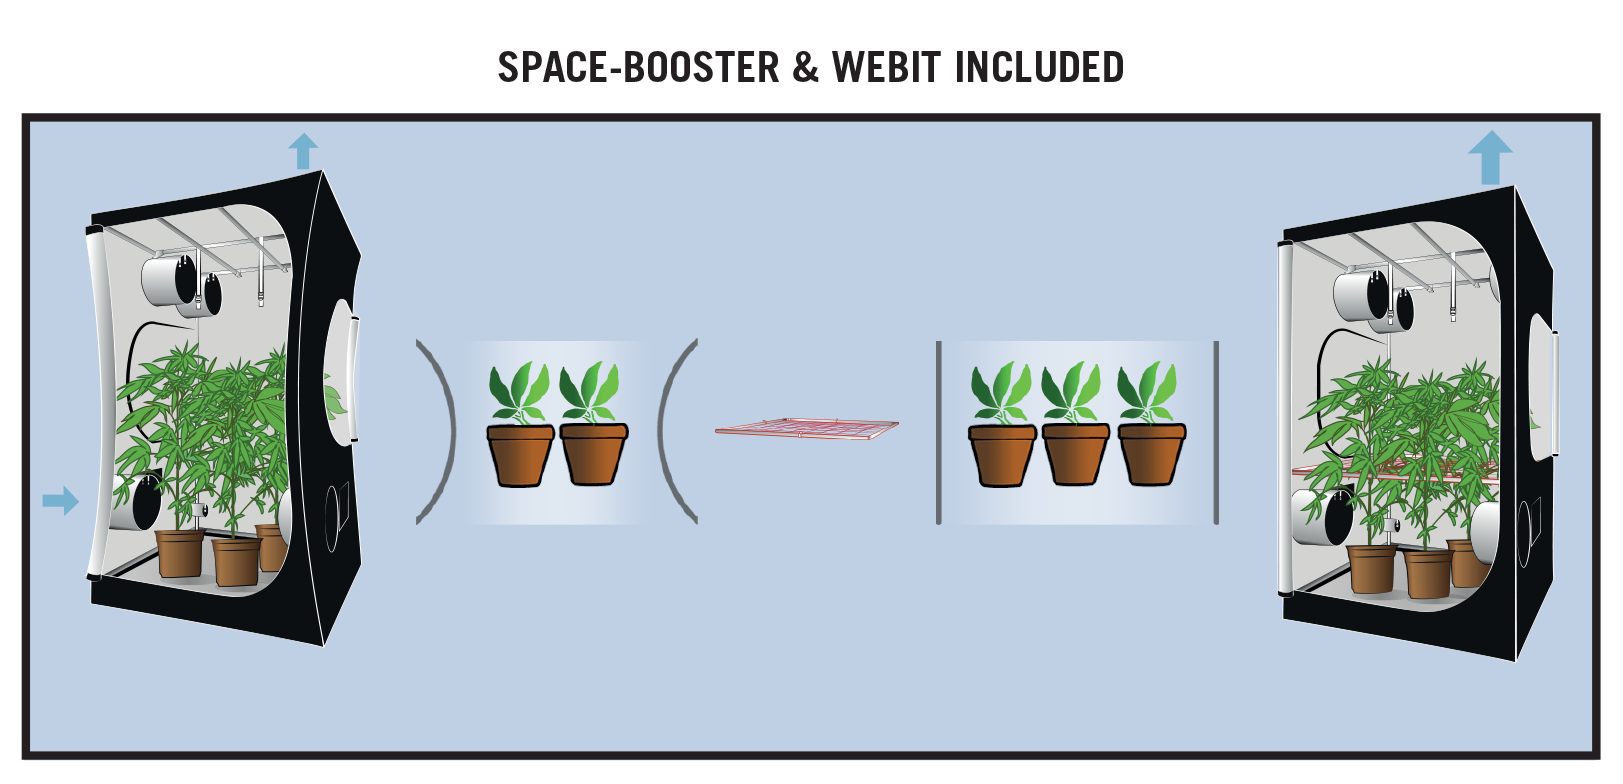 Secret Jardin Dark Room R3.00 300x300x235 см. (гроубокс для выращивания растений)